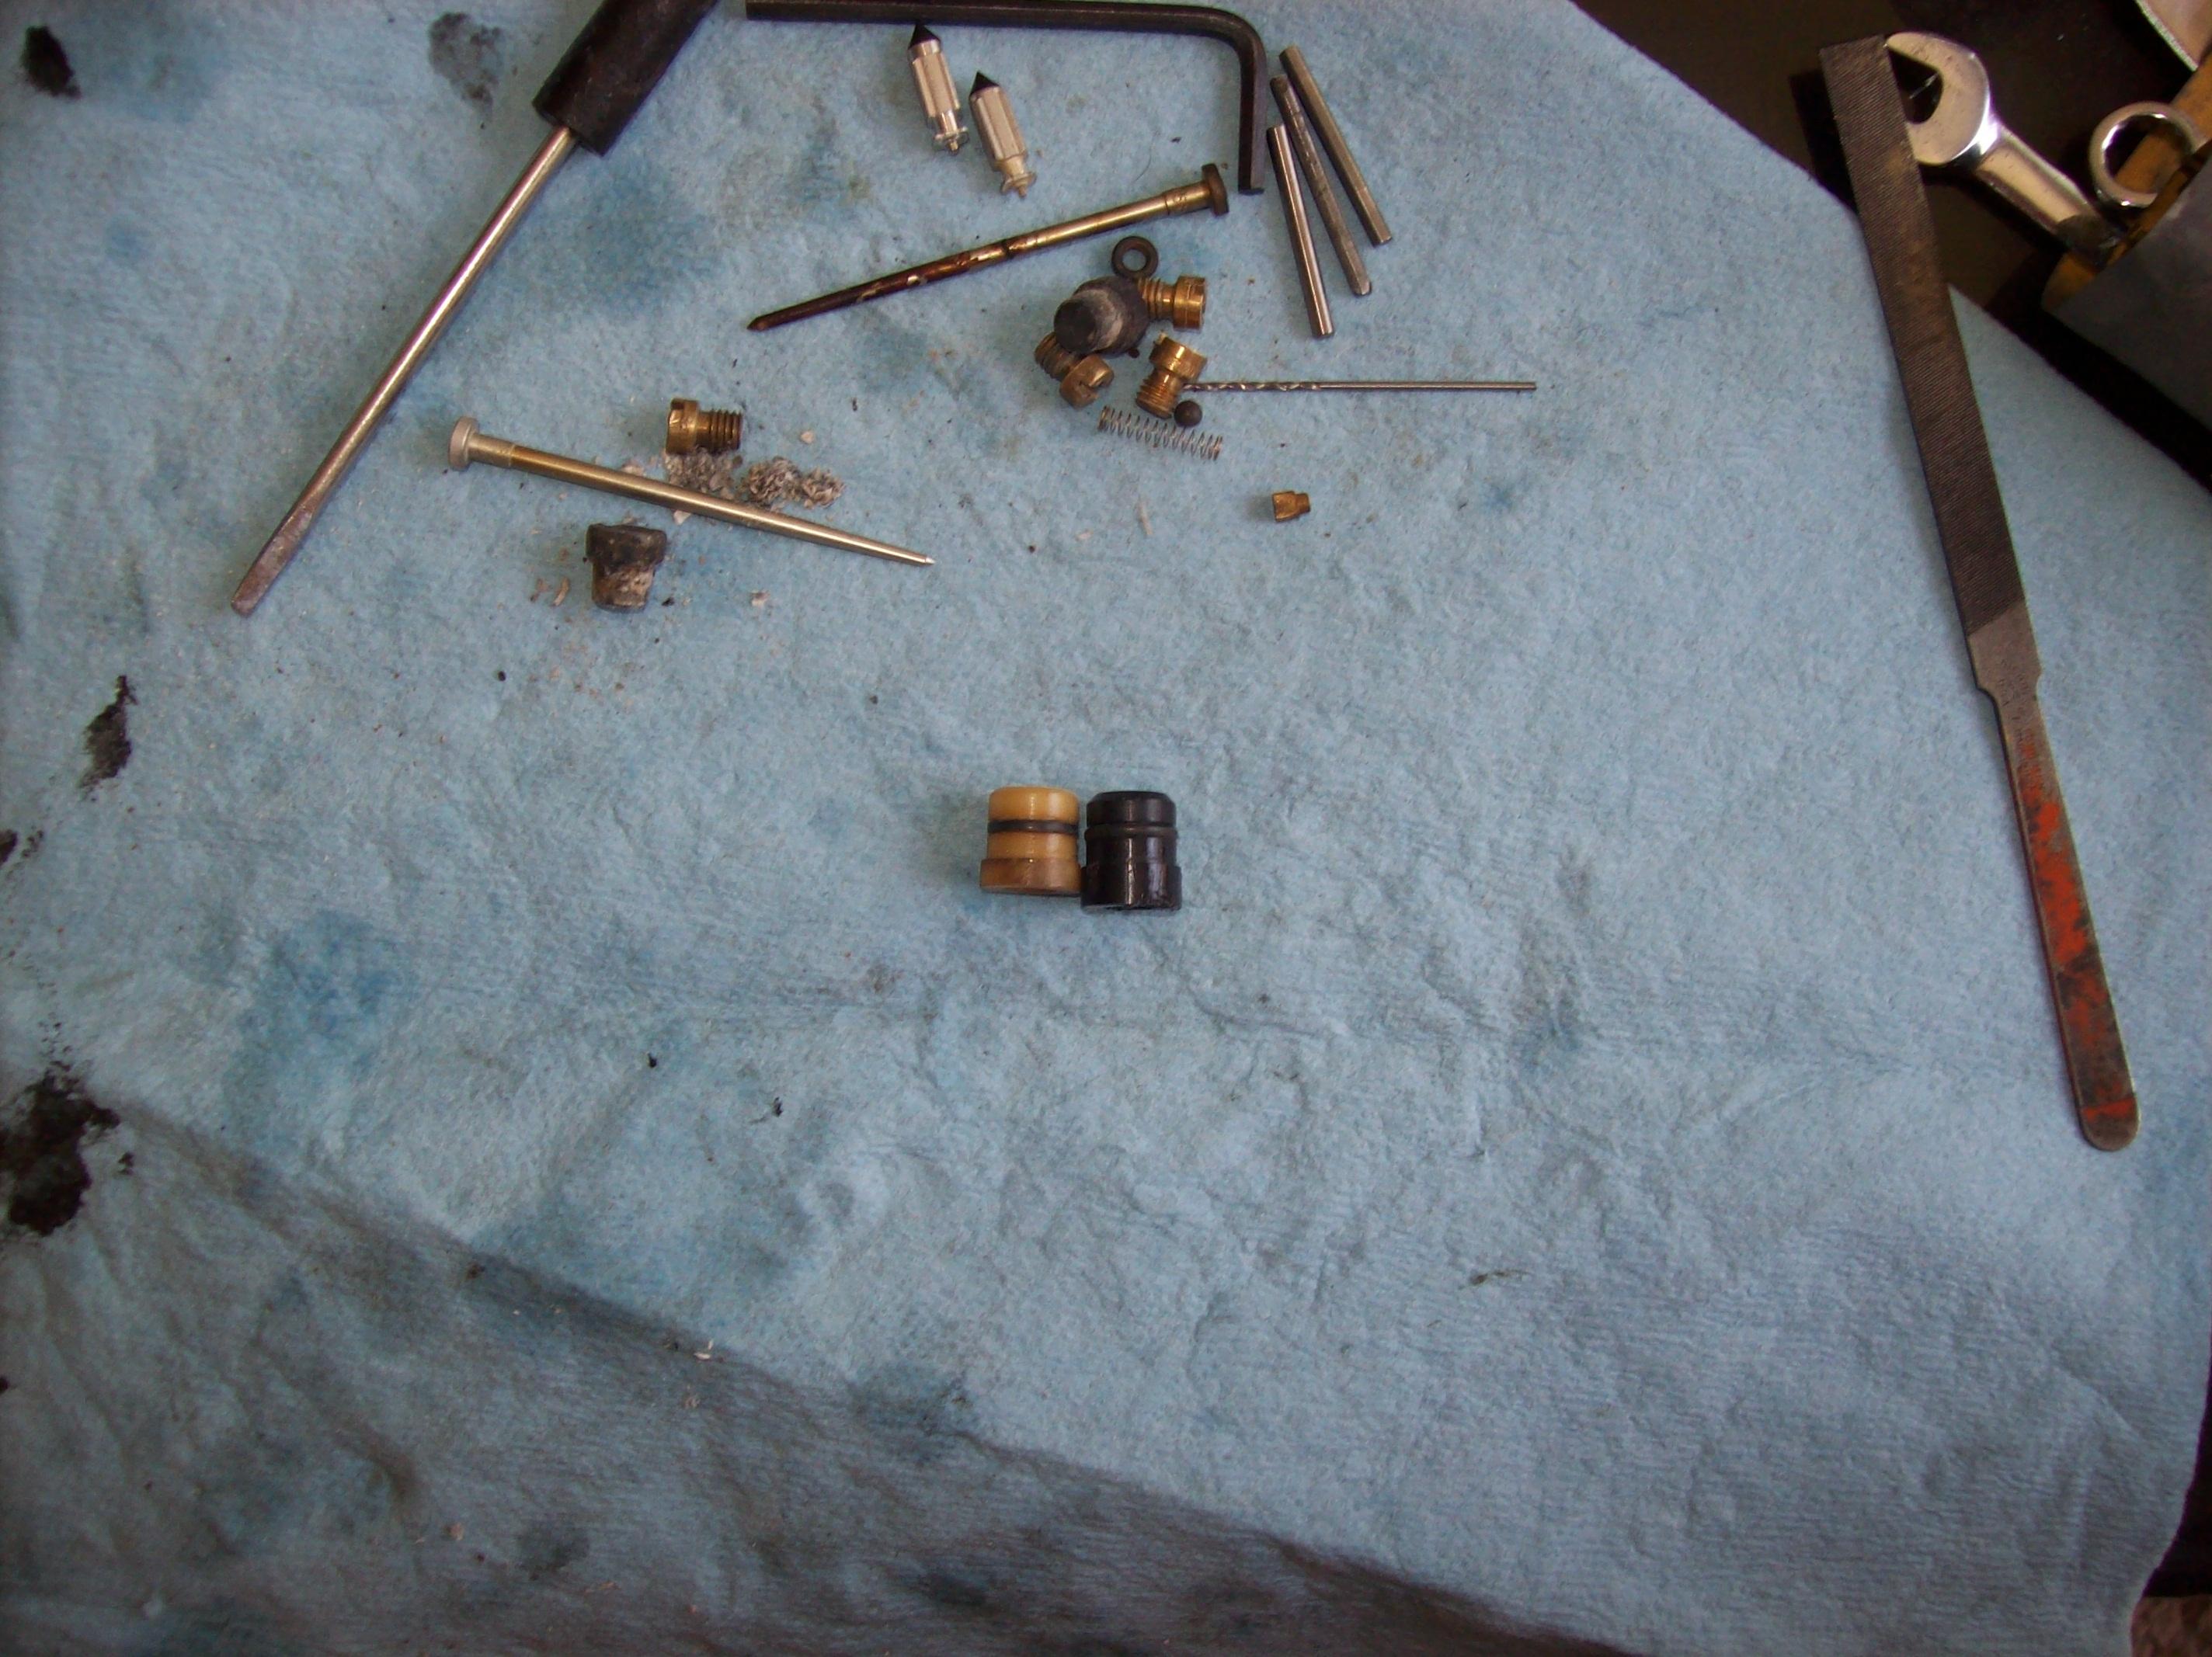 Rebuilding VB Carbs-201_4685.jpg